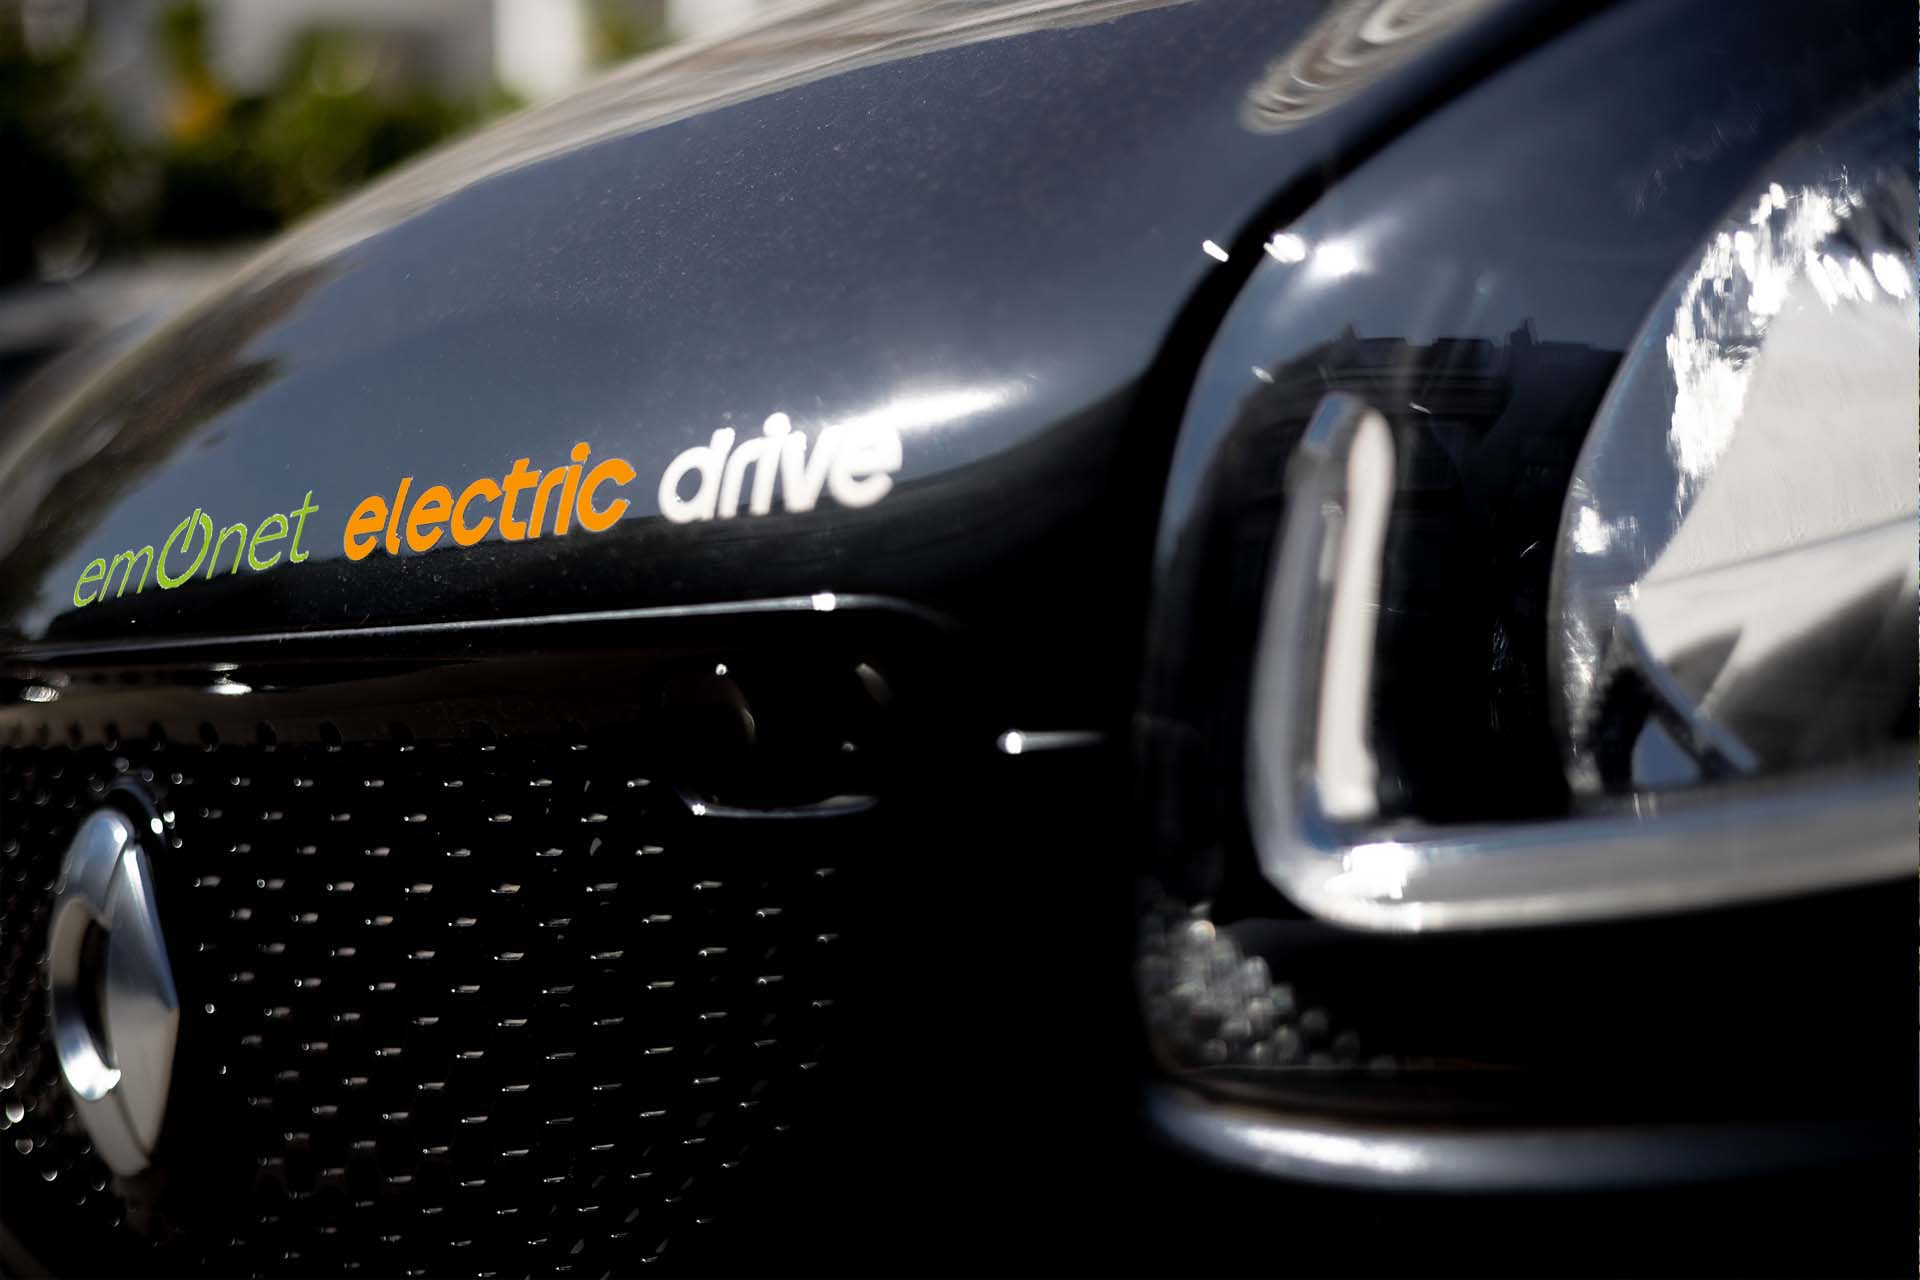 Emobilität Ladepunkte Emonet Car-Sharing